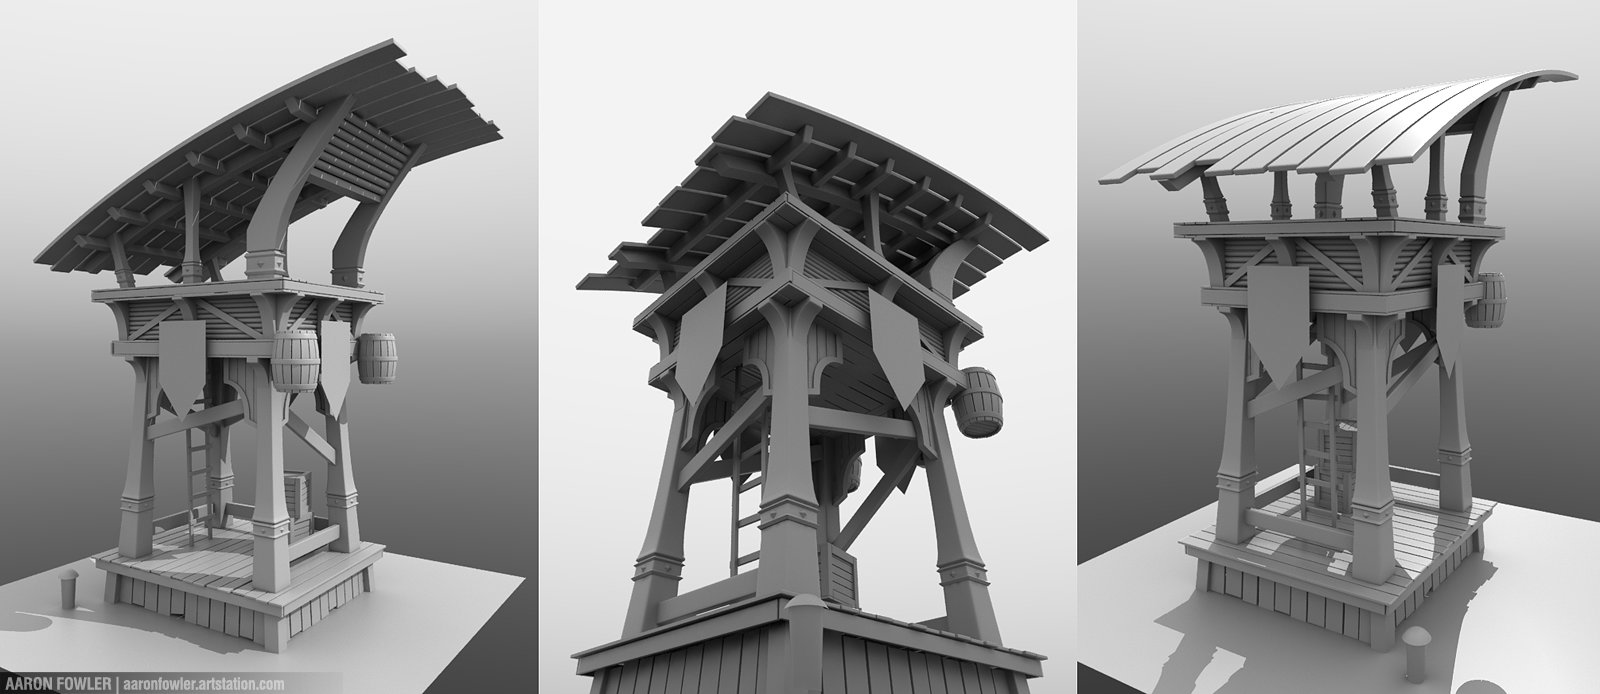 aaron-fowler-aaron-fowler-piratetower.jpg?1437671052